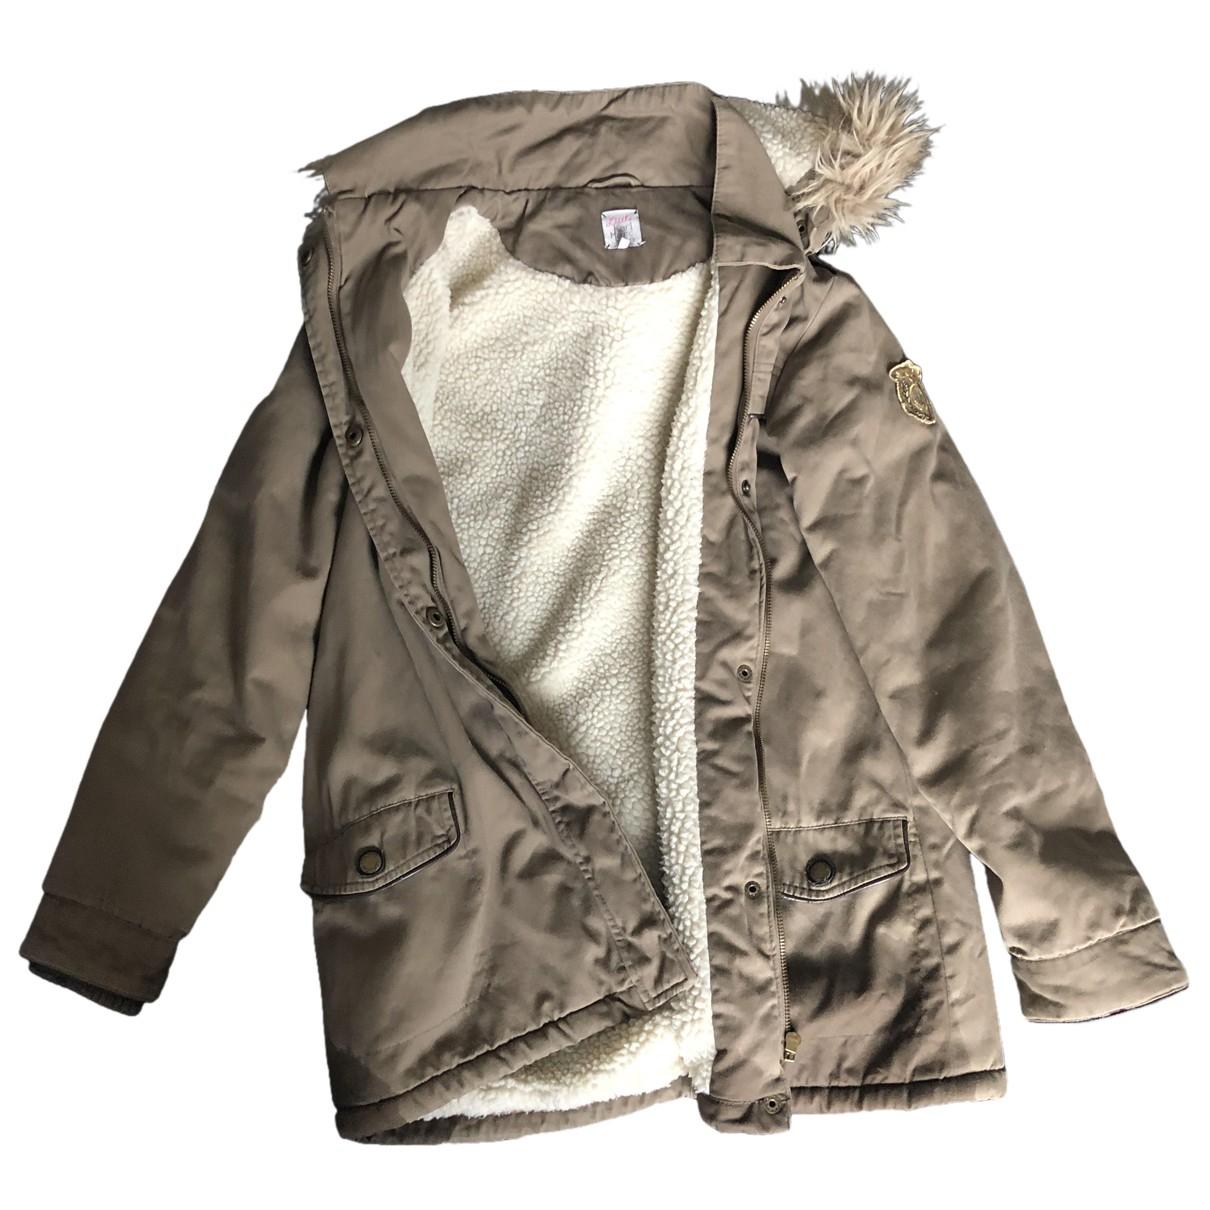 Karl Marc John N Camel Cotton jacket & coat for Kids 14 years - S FR